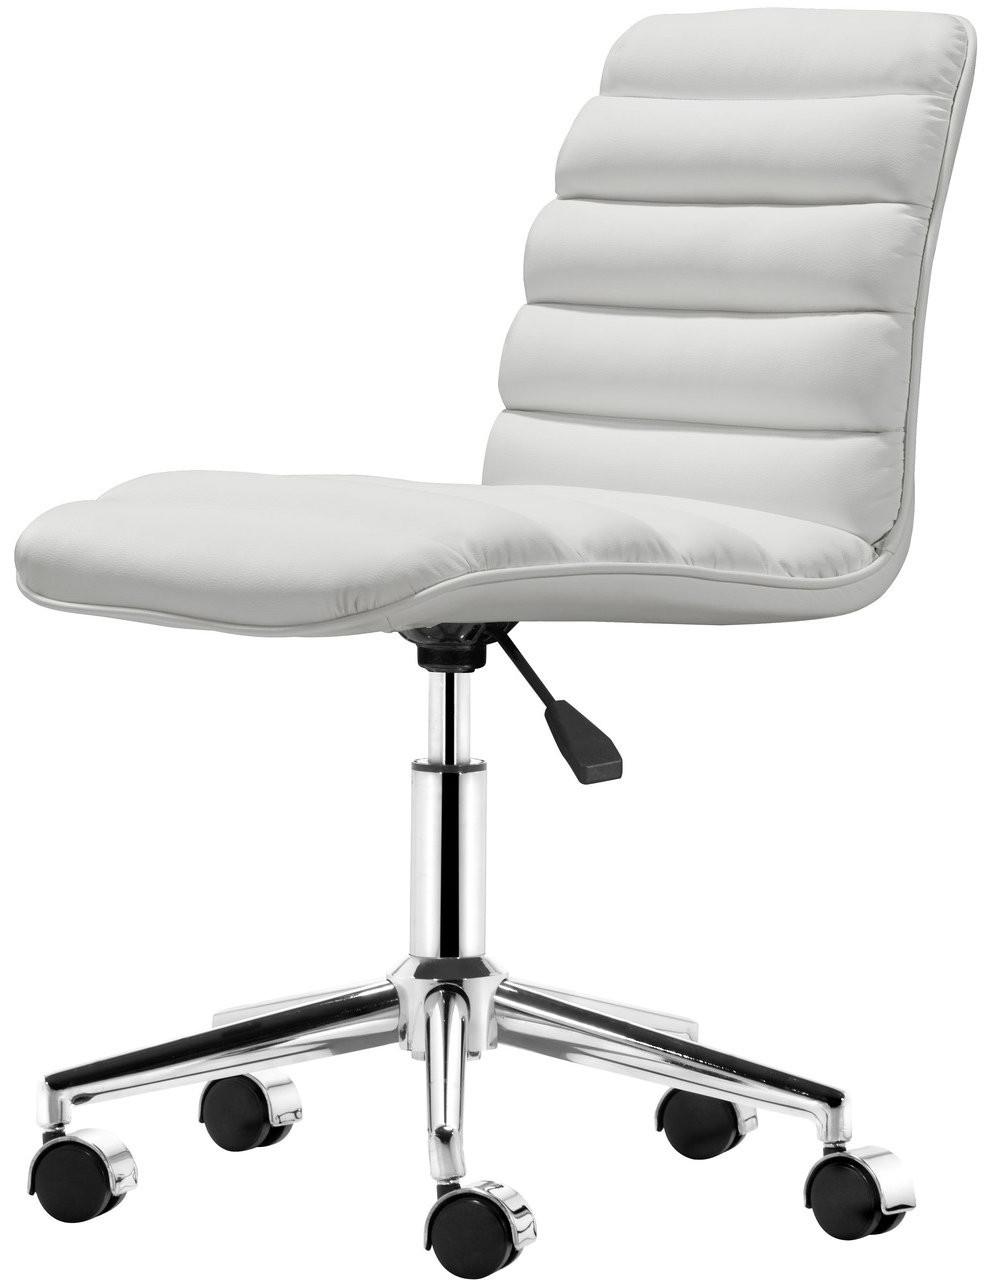 zuo modern admire office chair white zuo modern 205711. Black Bedroom Furniture Sets. Home Design Ideas